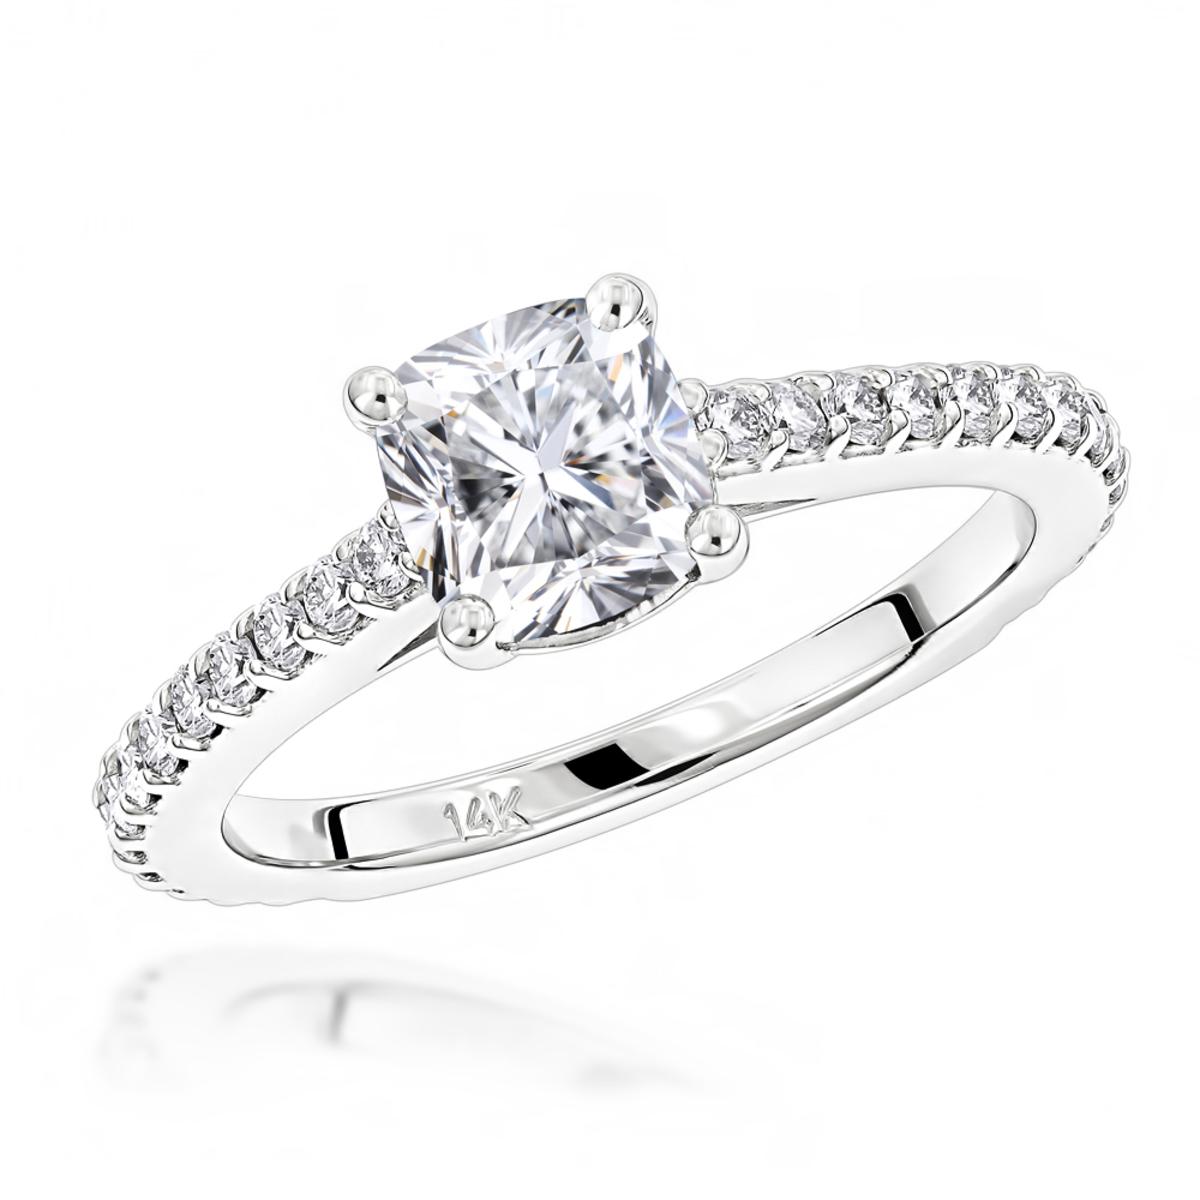 Classic 14K Gold Cushion Diamond Engagement Ring by Luxurman 1.4ct G/VS